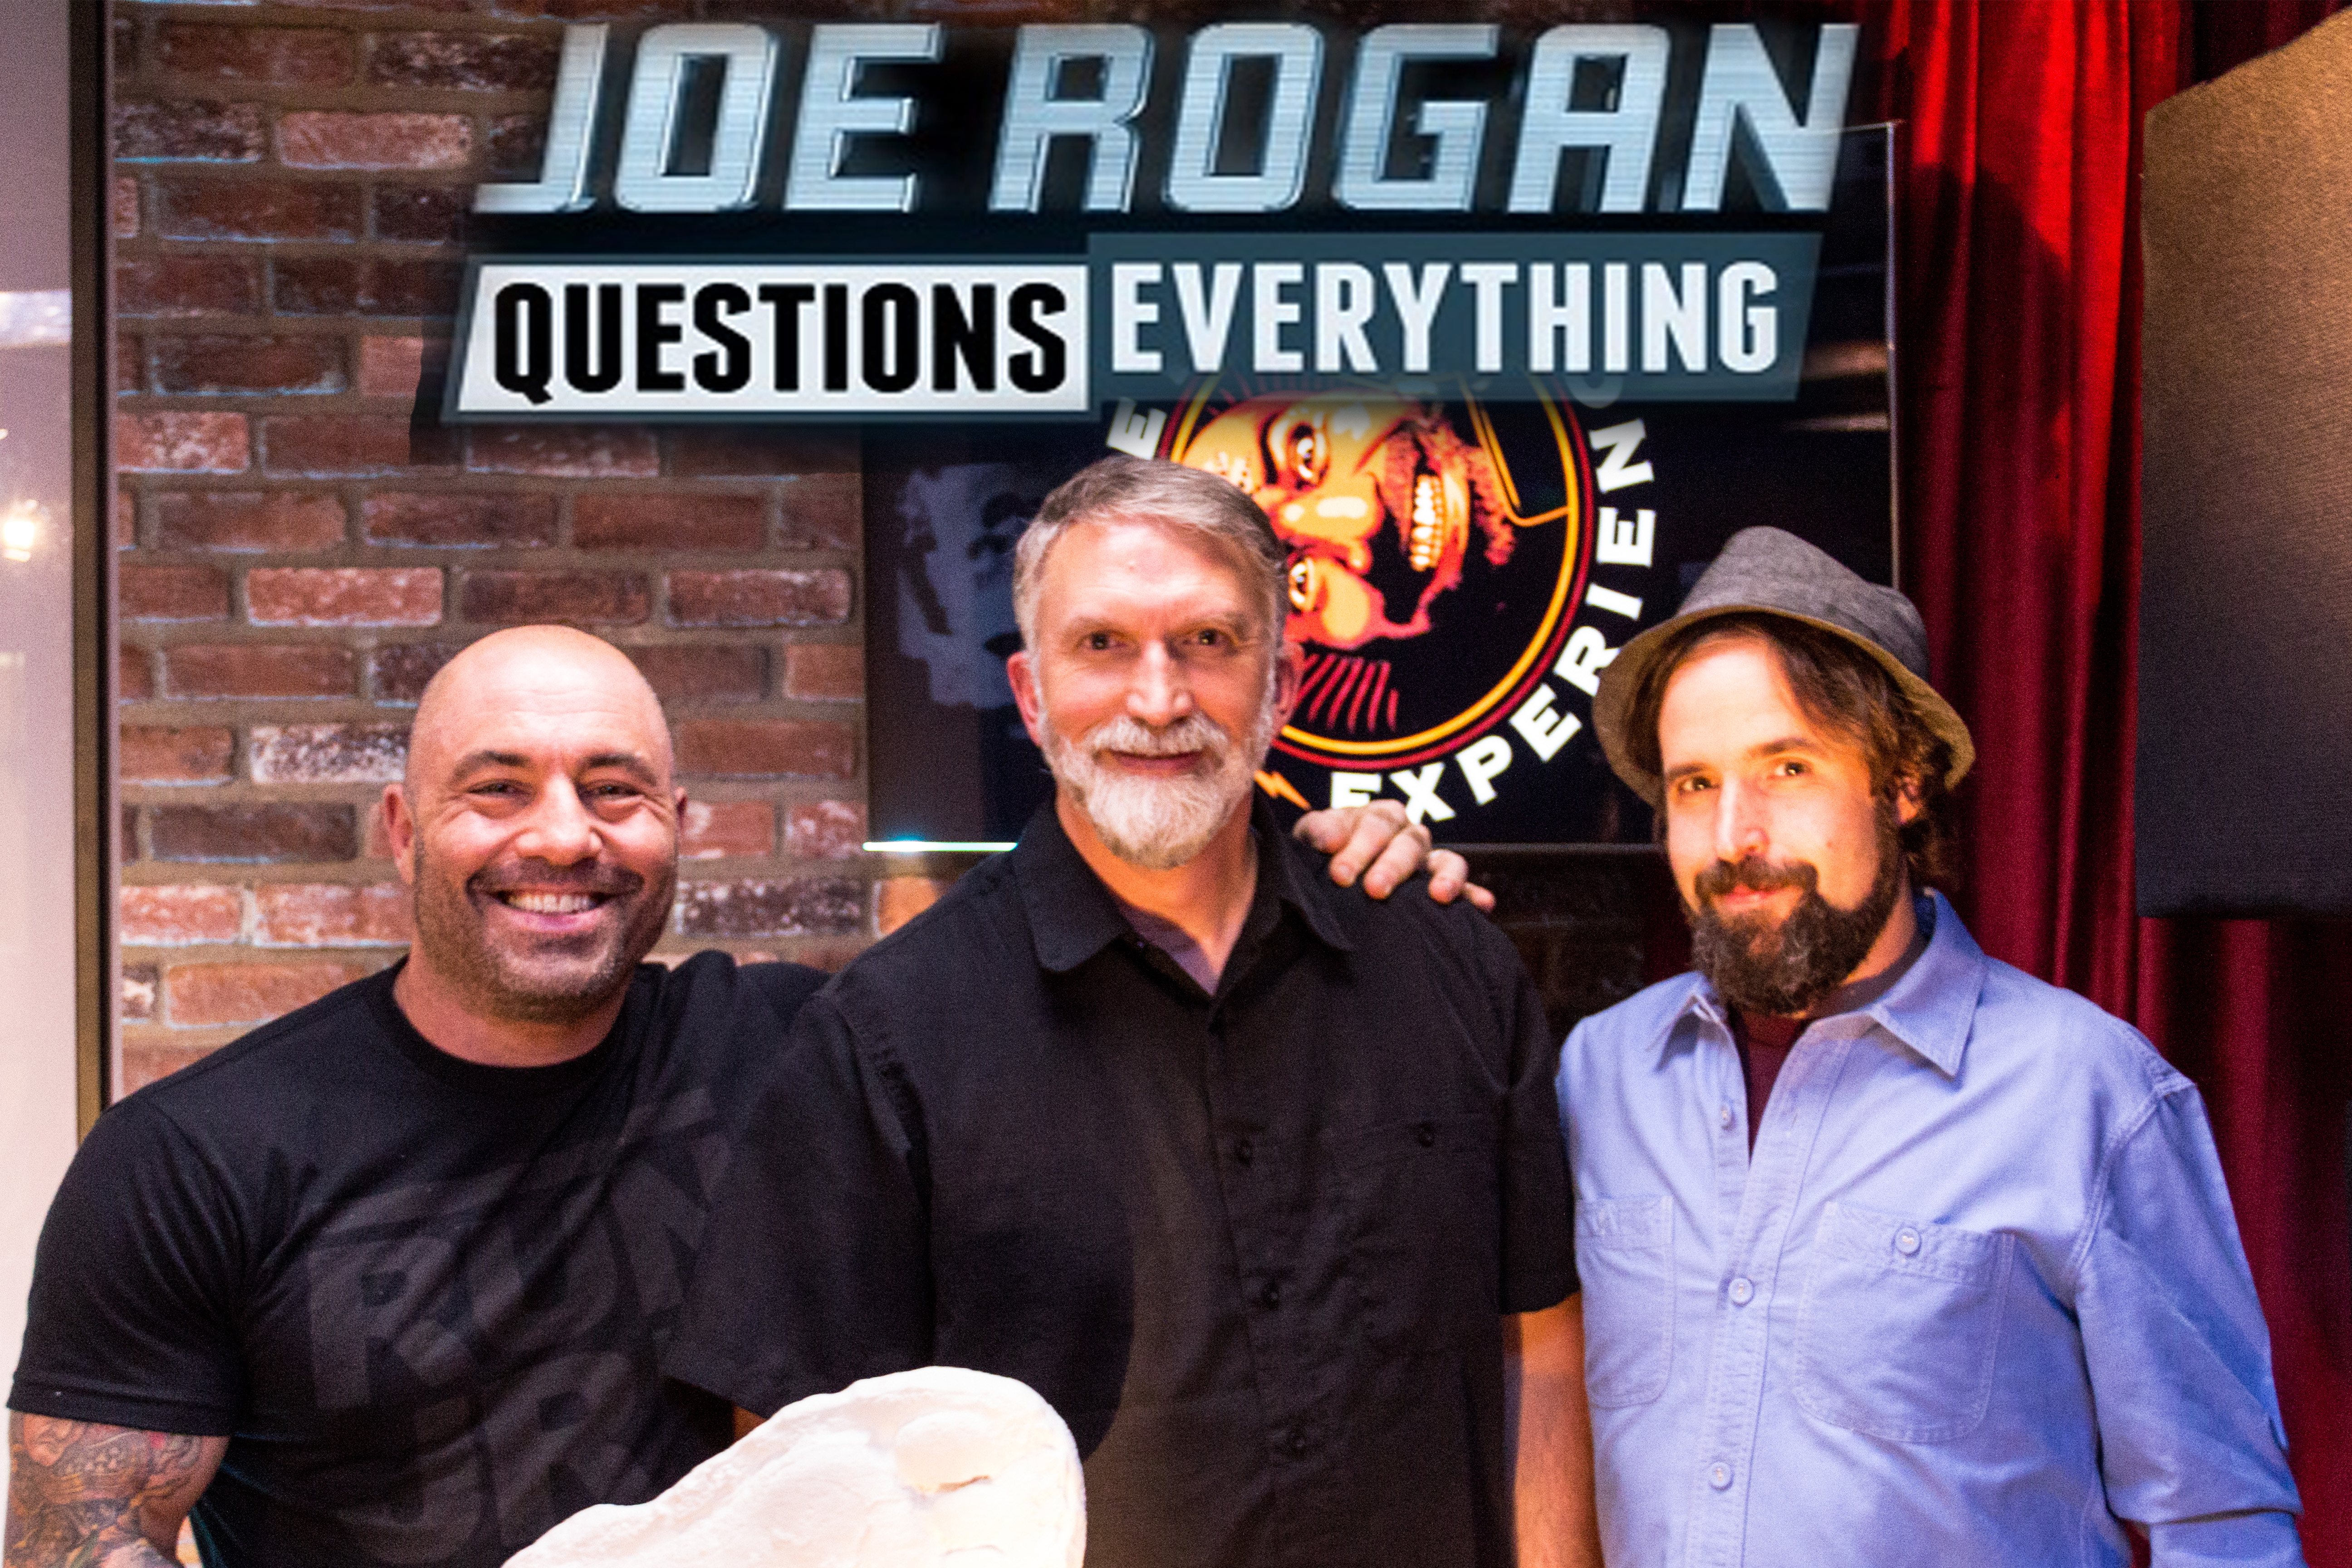 The Joe Rogan Experience JRQE#2 - Dr. Jeff Meldrum, Duncan Trussell